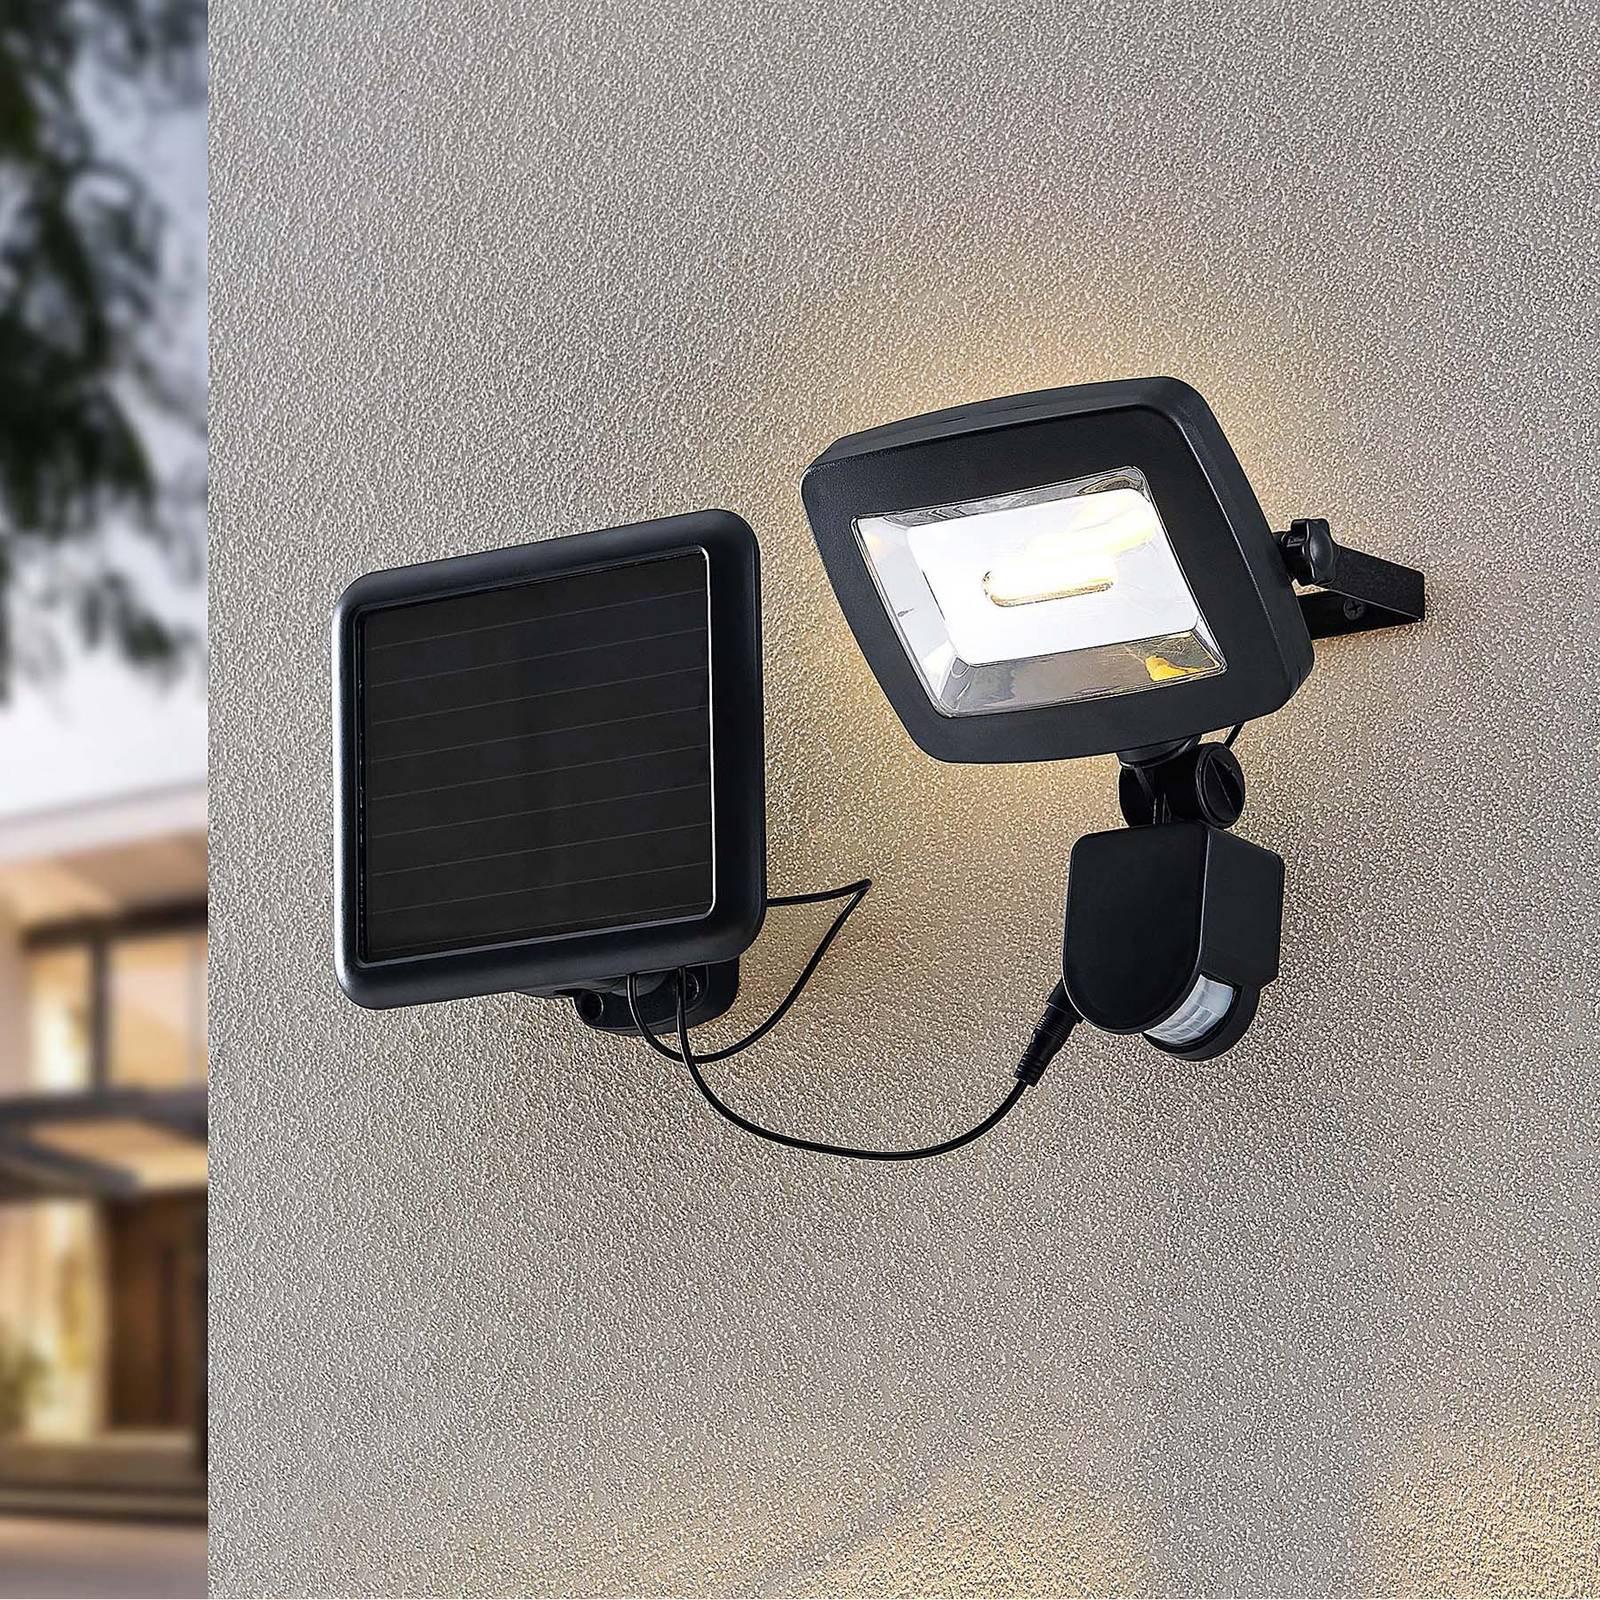 Lindby Cathal LED-aurinkoseinäkohdevalaisin